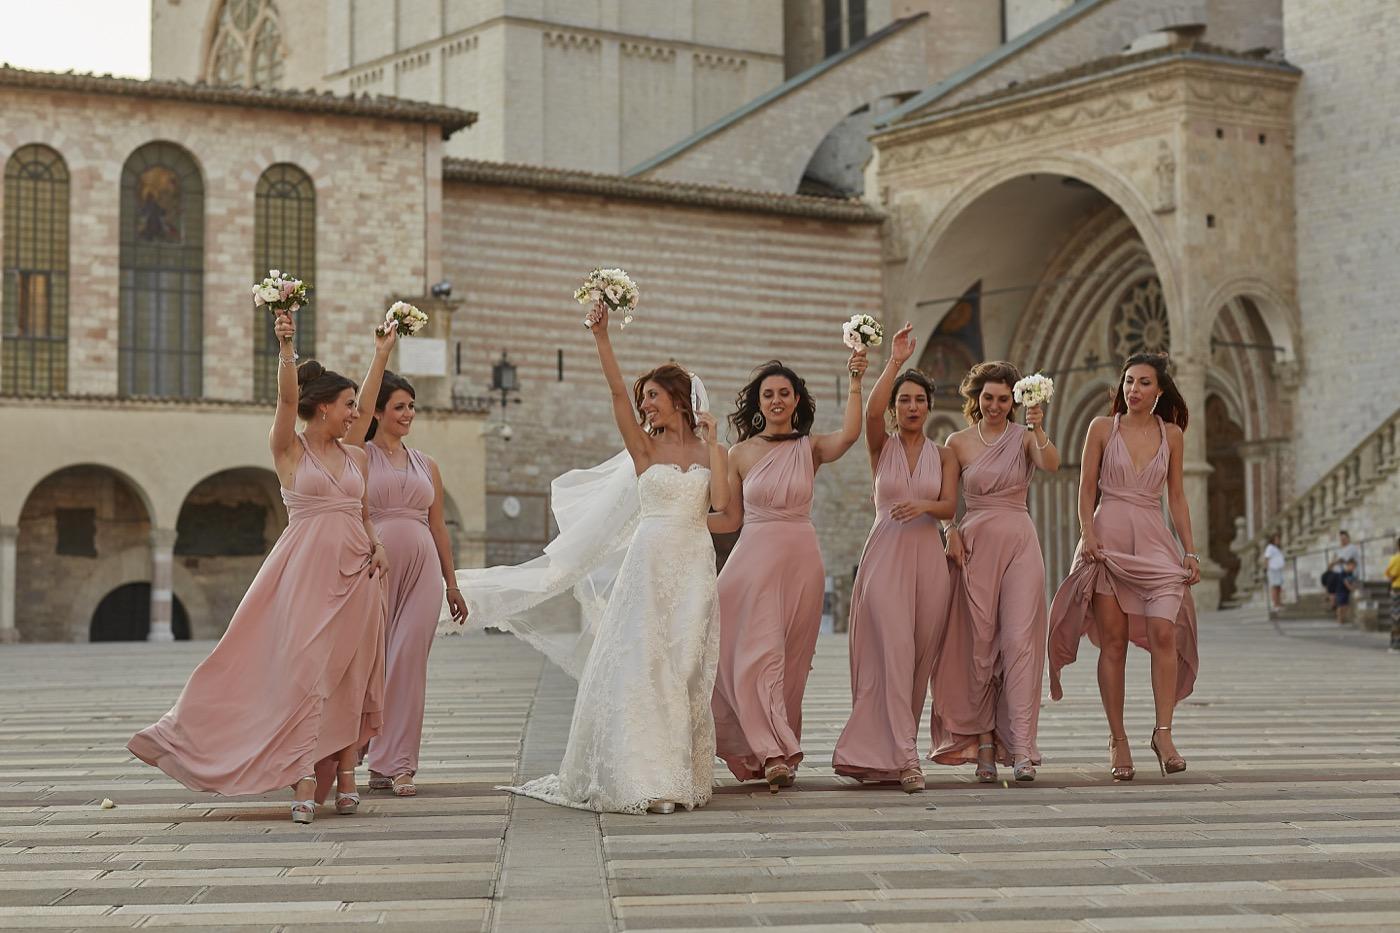 Claudio-Coppola-wedding-photographer-abbazia-7-frati-piegaro-83